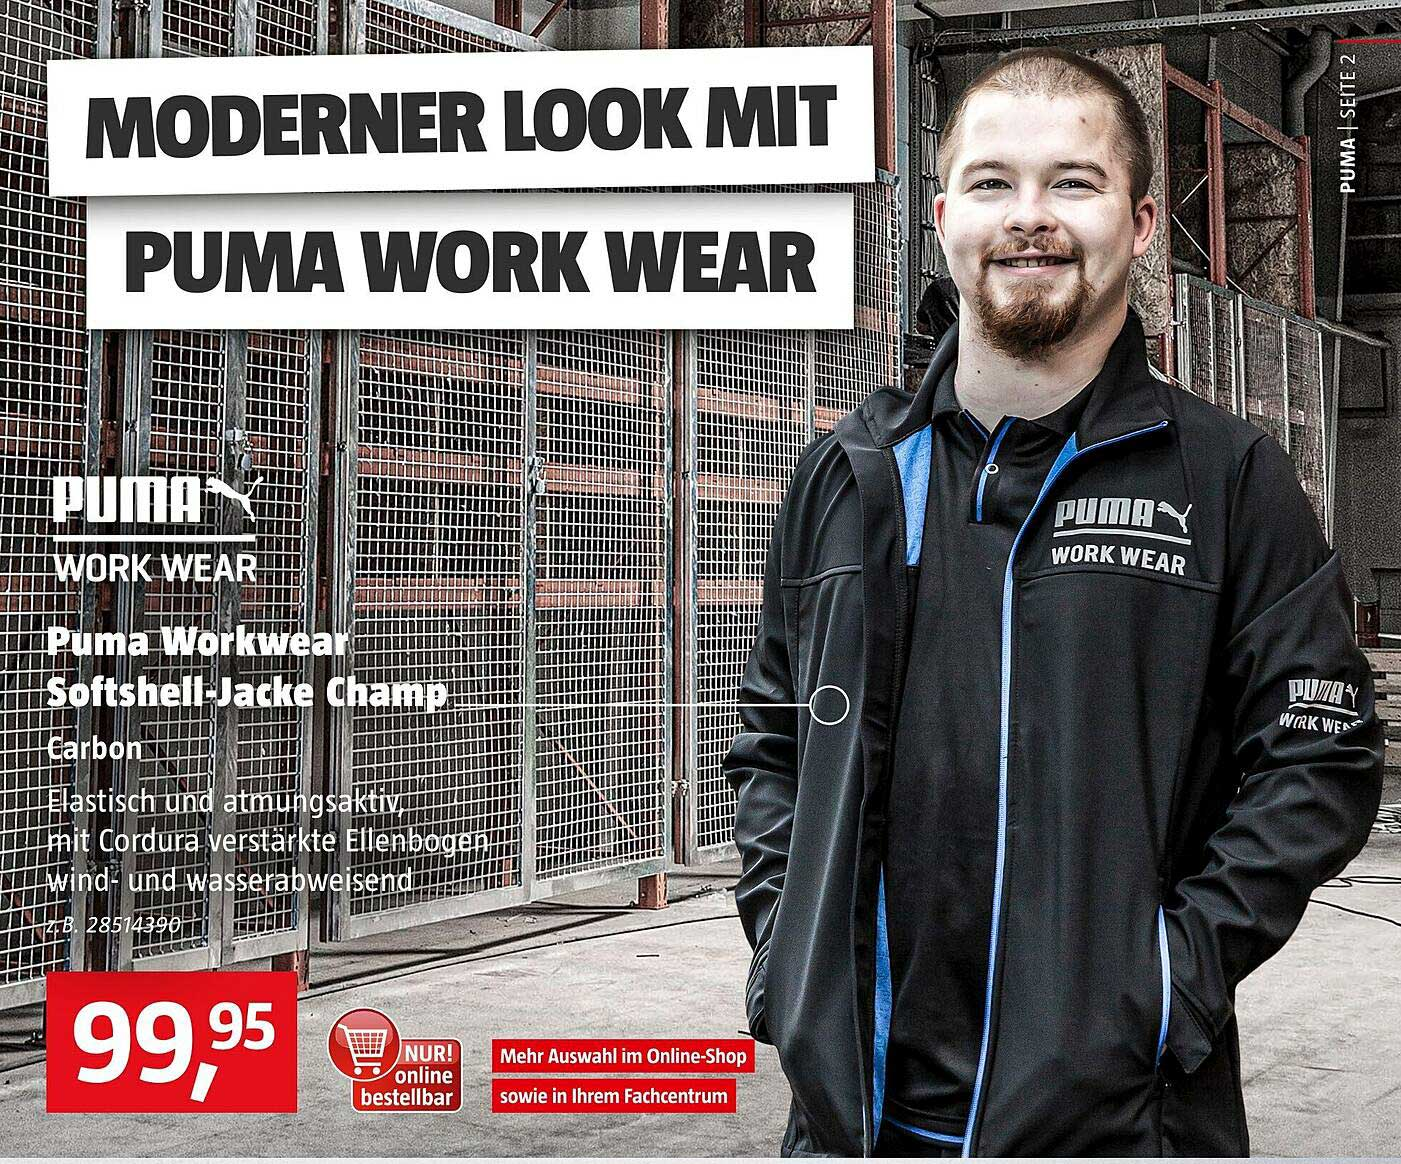 Bauhaus Puma Workwear Softshell-jacke Champ Puma